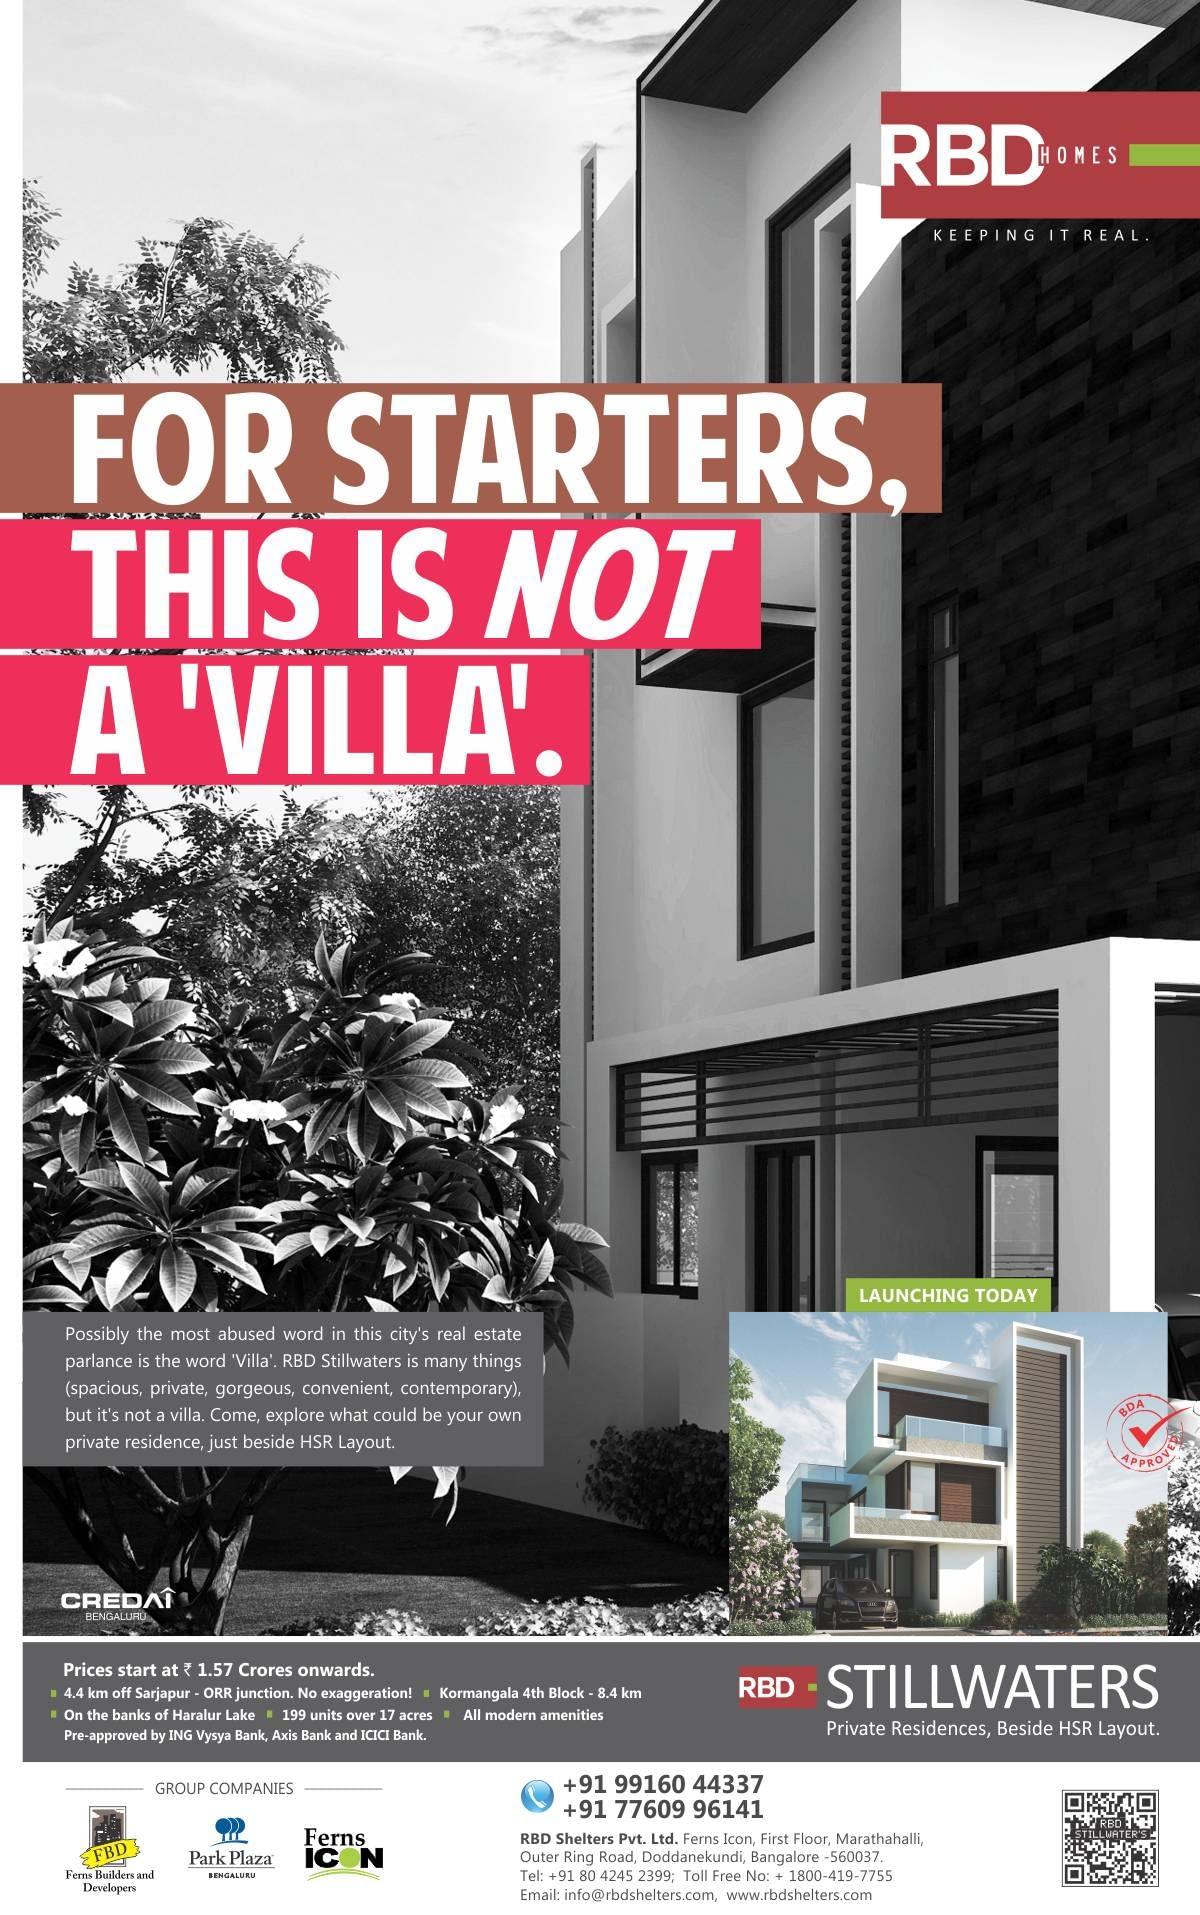 RBD stillwaters ads